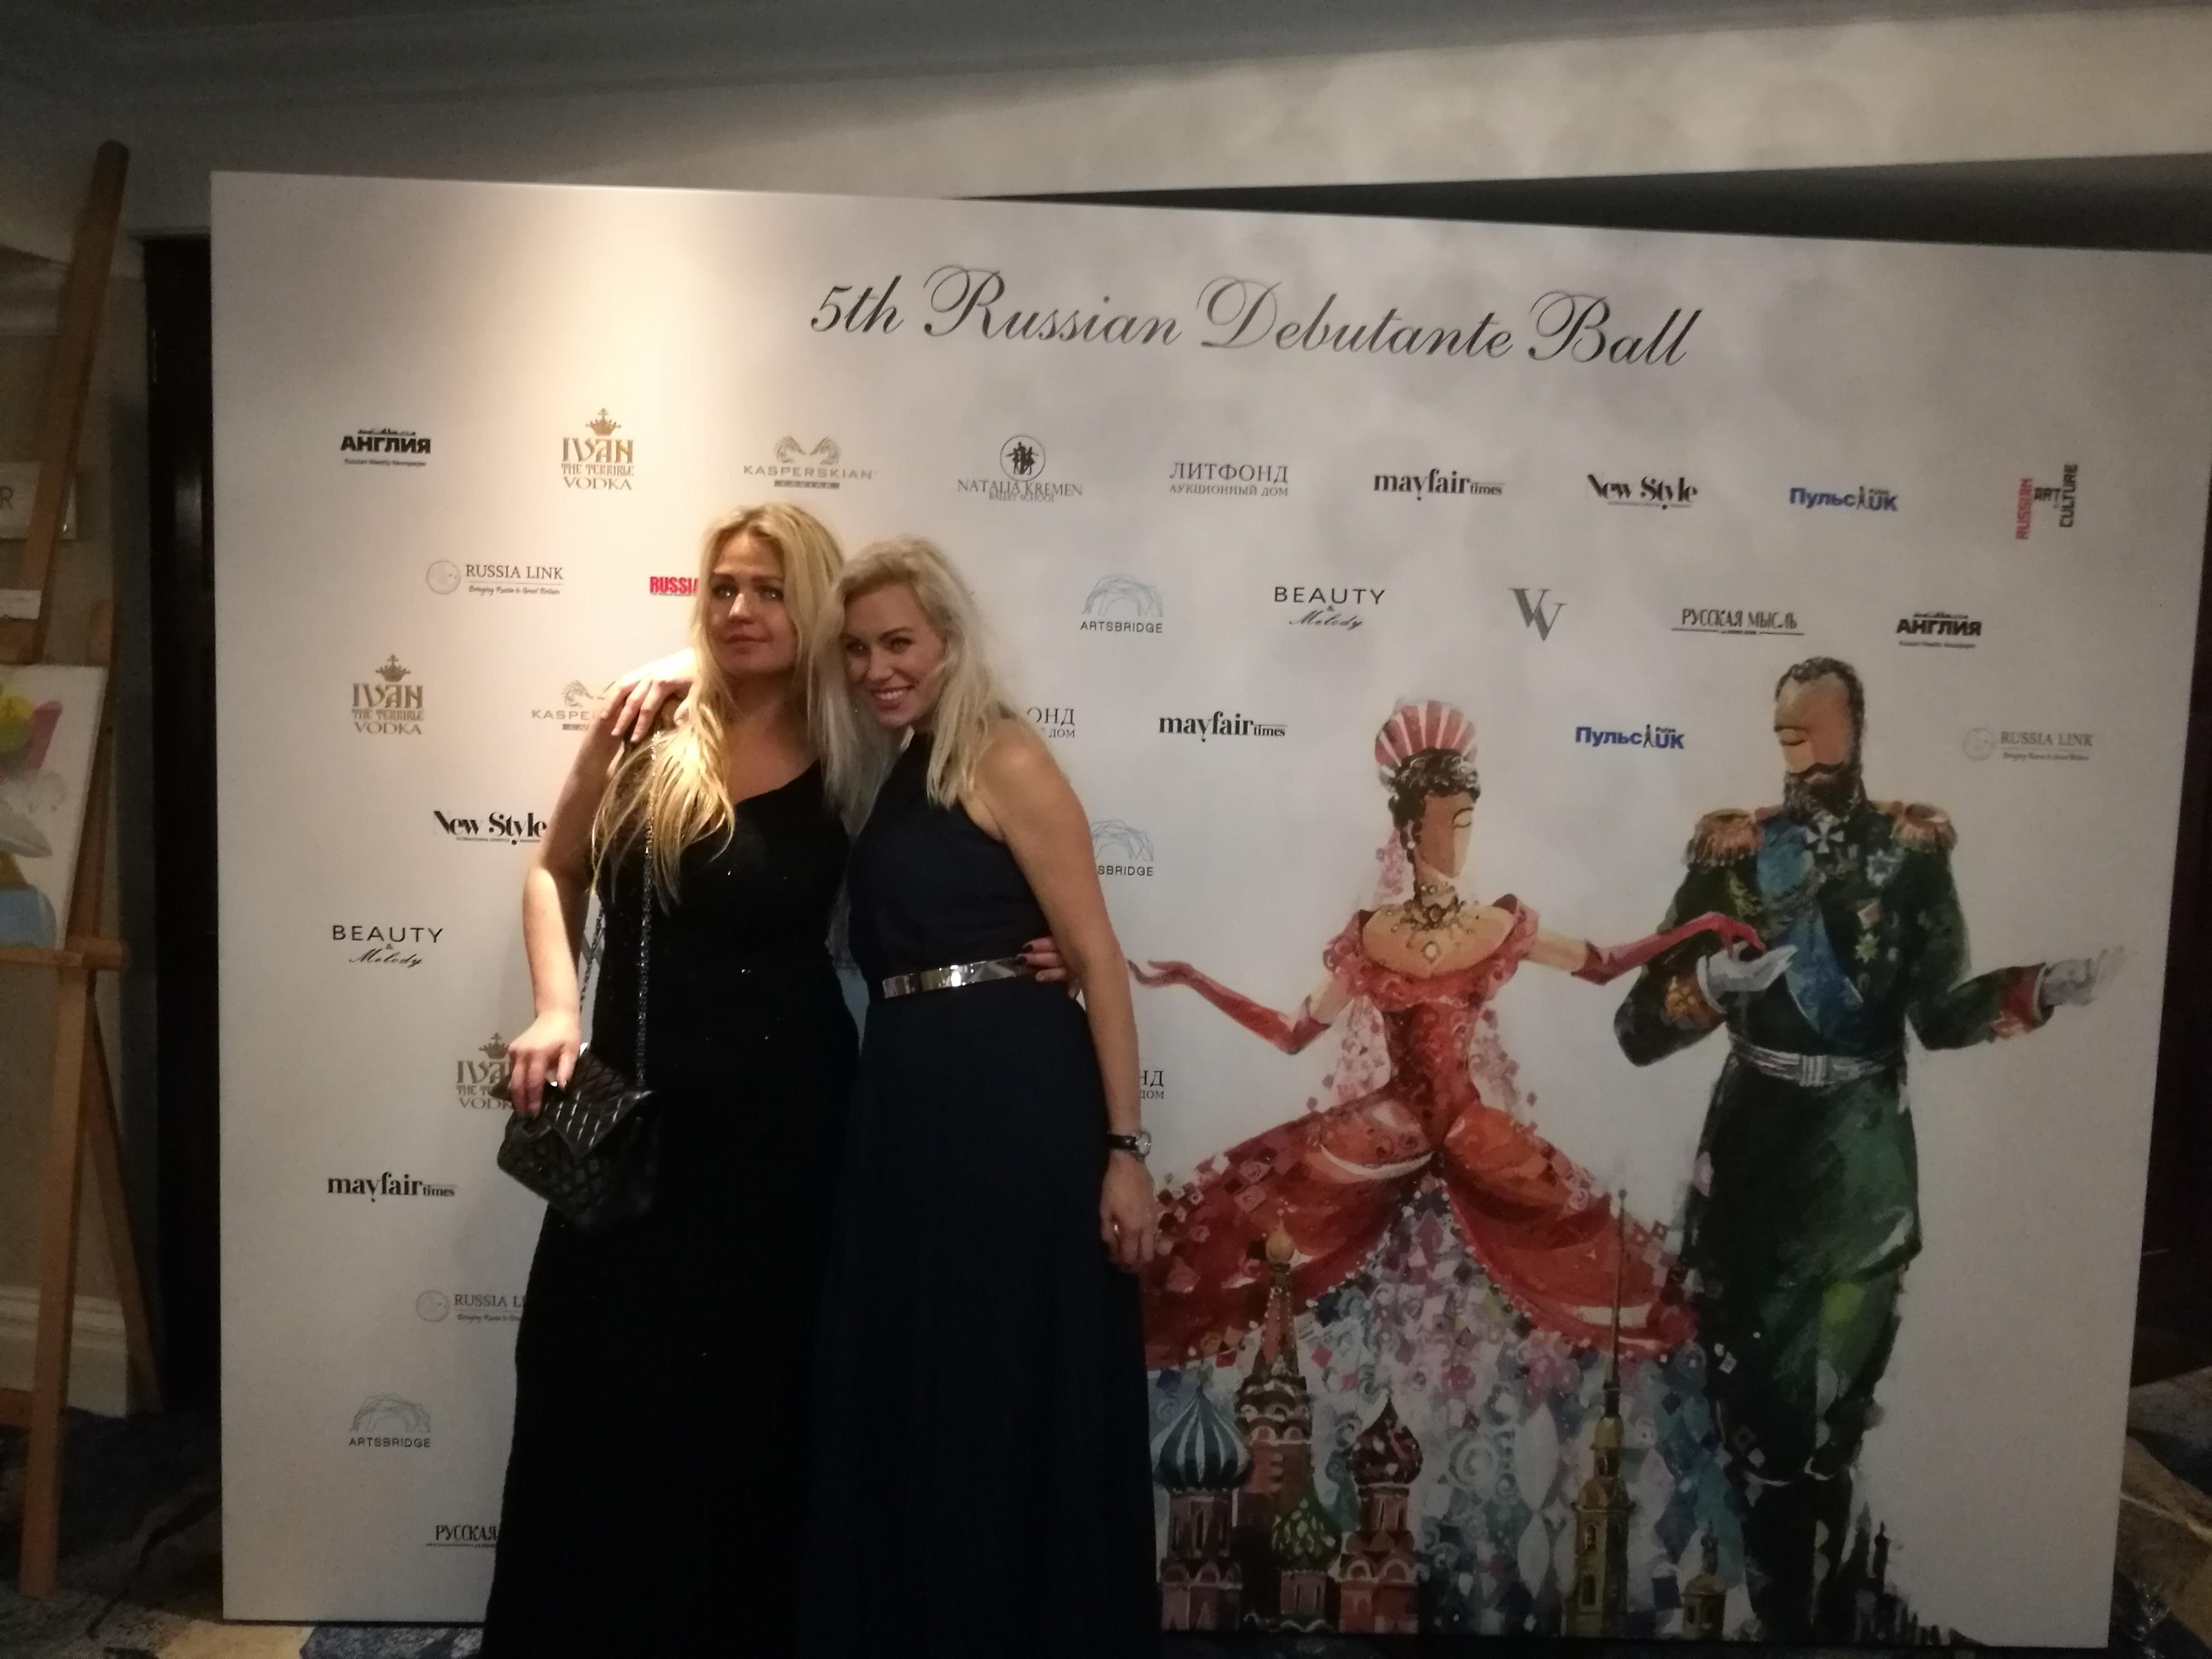 Russian Debutante Ball London coverage JNewsNetwork